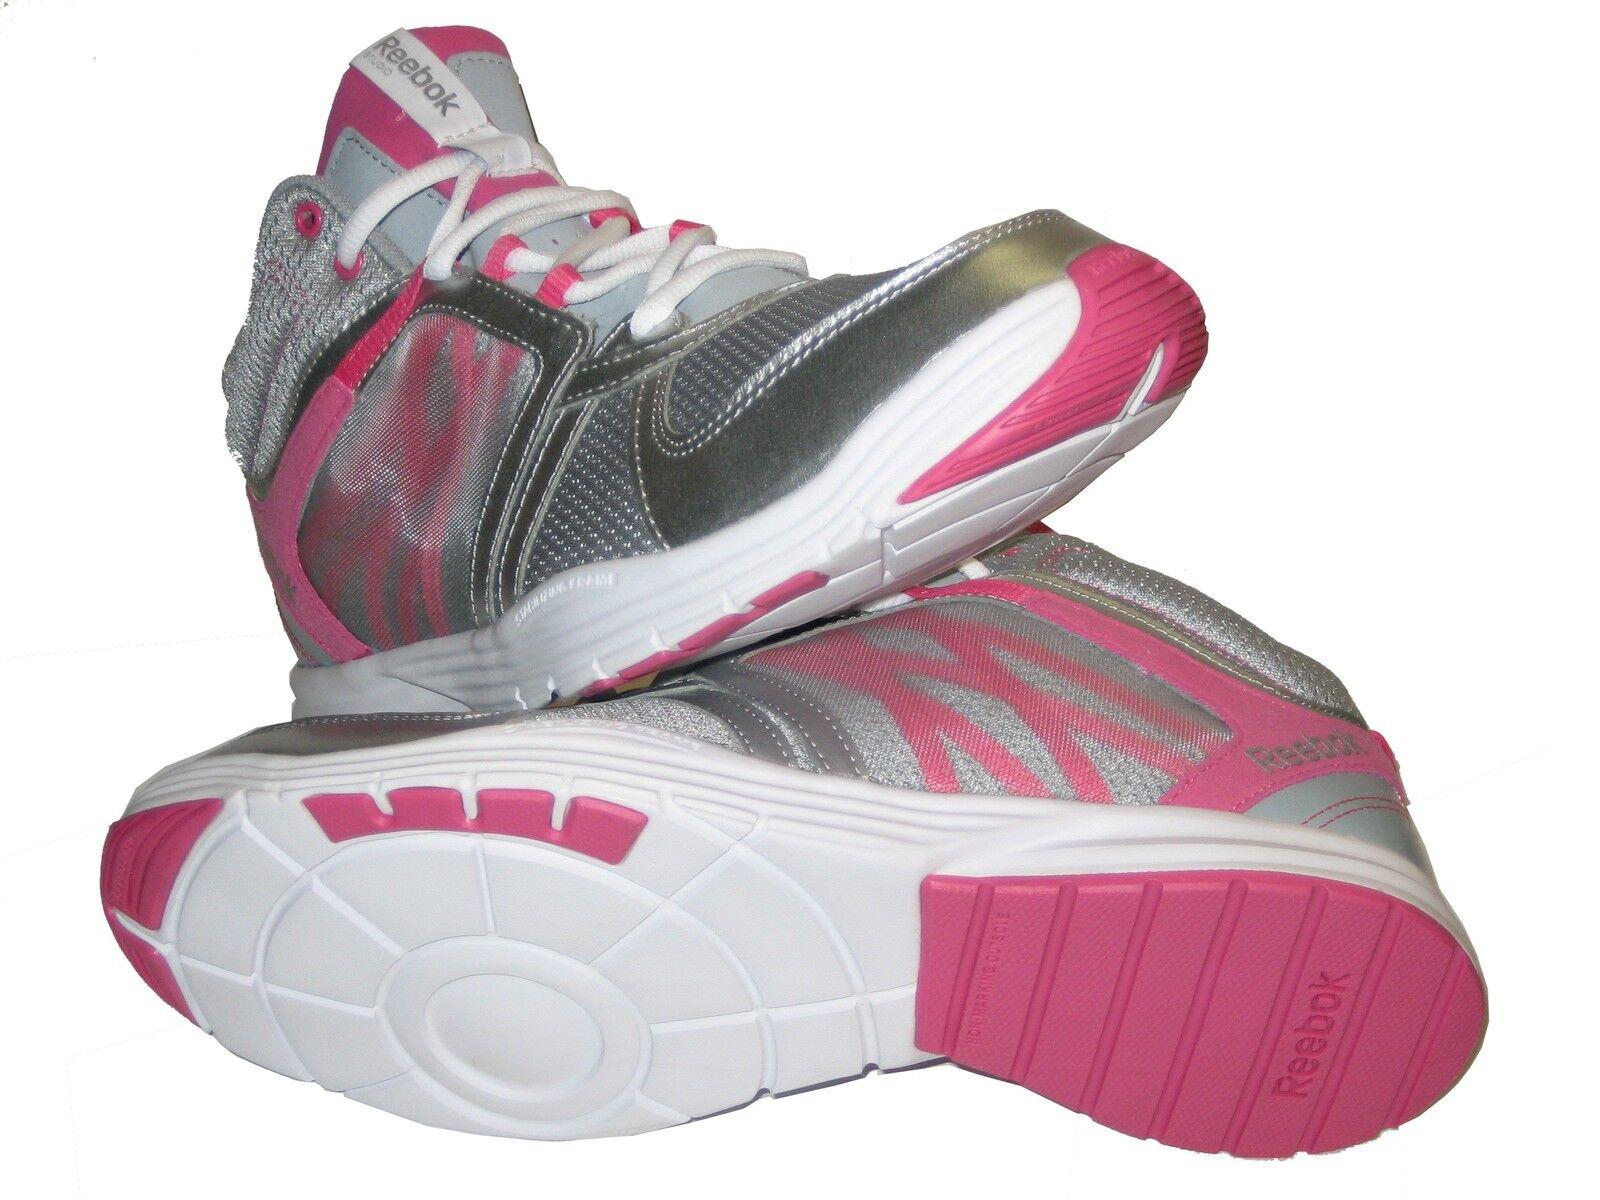 Reebok Sublite Studio Flame M42411 Grey Silver Pink White Fitness Schuh Women